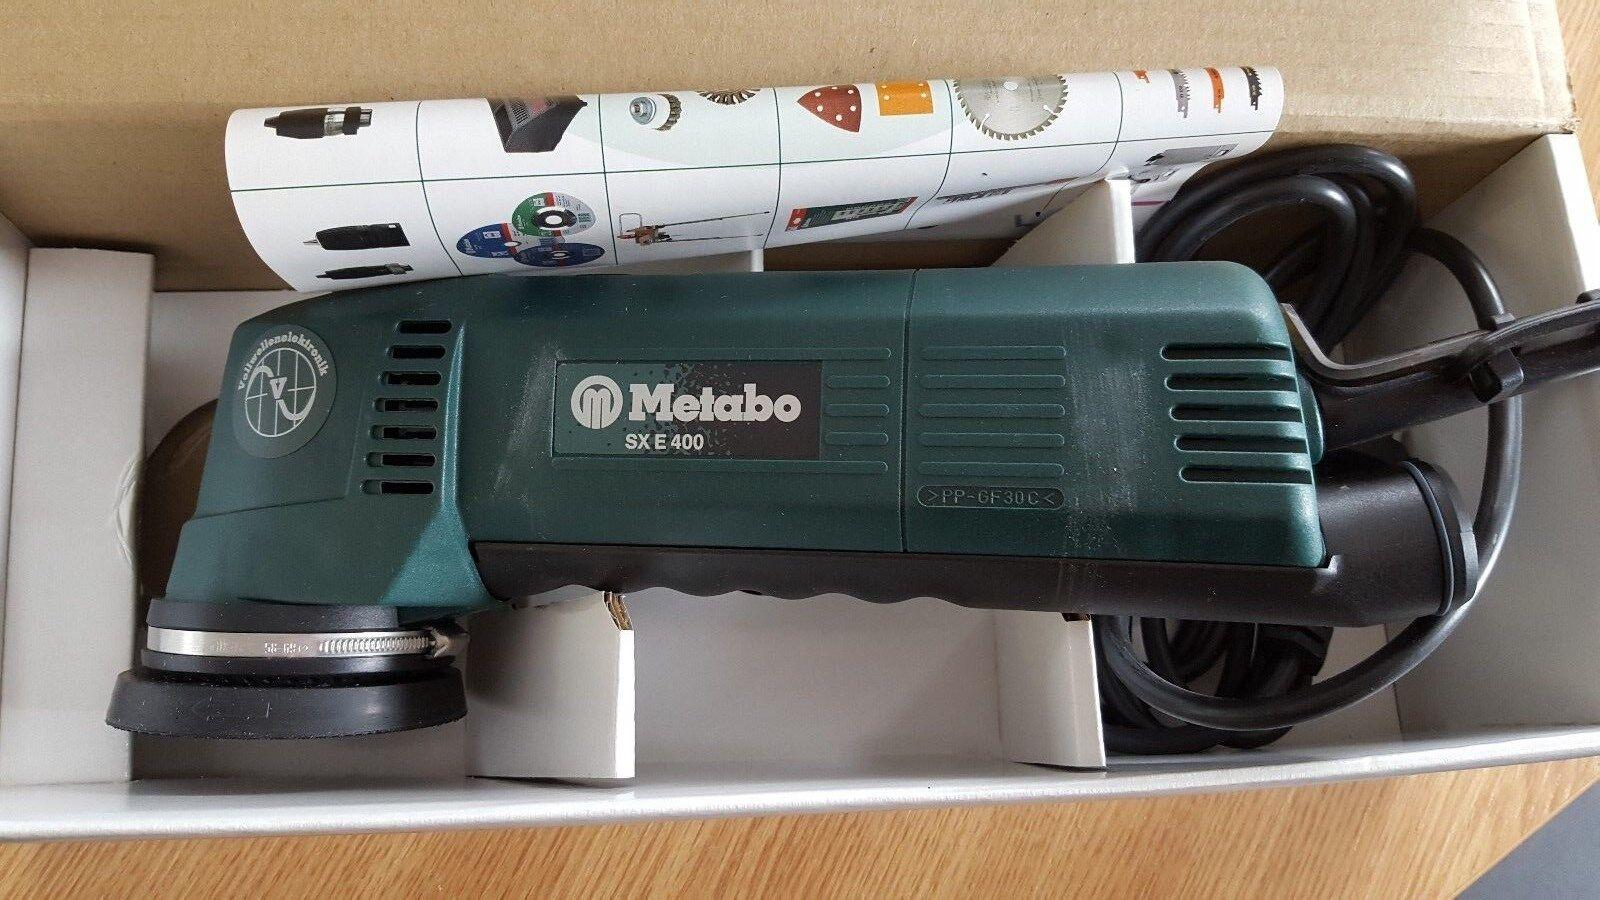 metabo exzenterschleifer sx e 400 | ebay